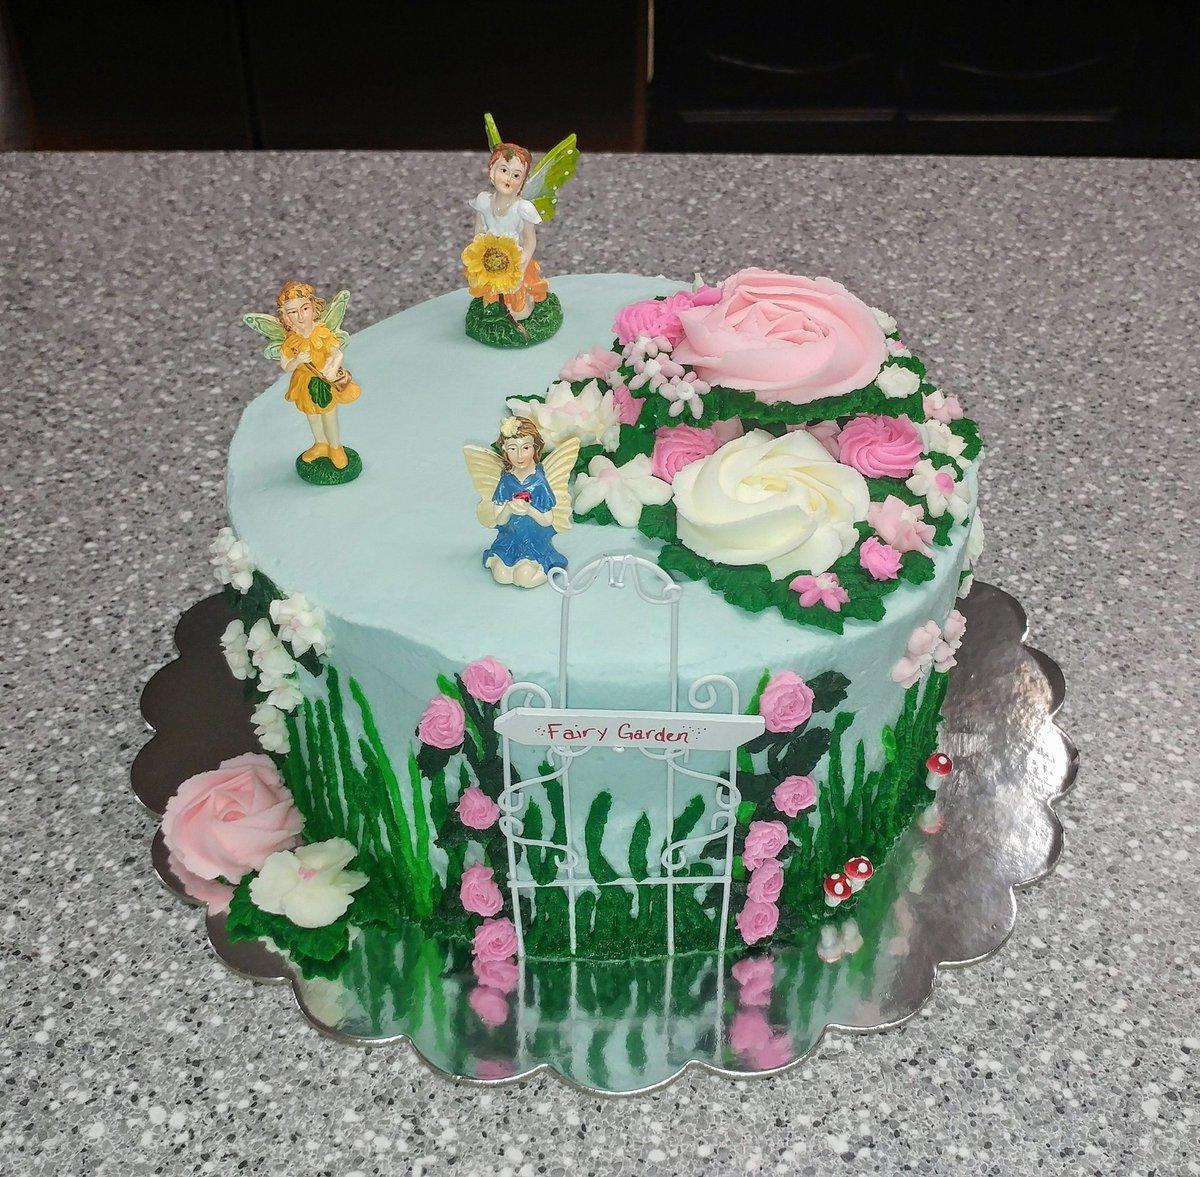 Cupcakes By Flea On Twitter Fairy Garden Cake